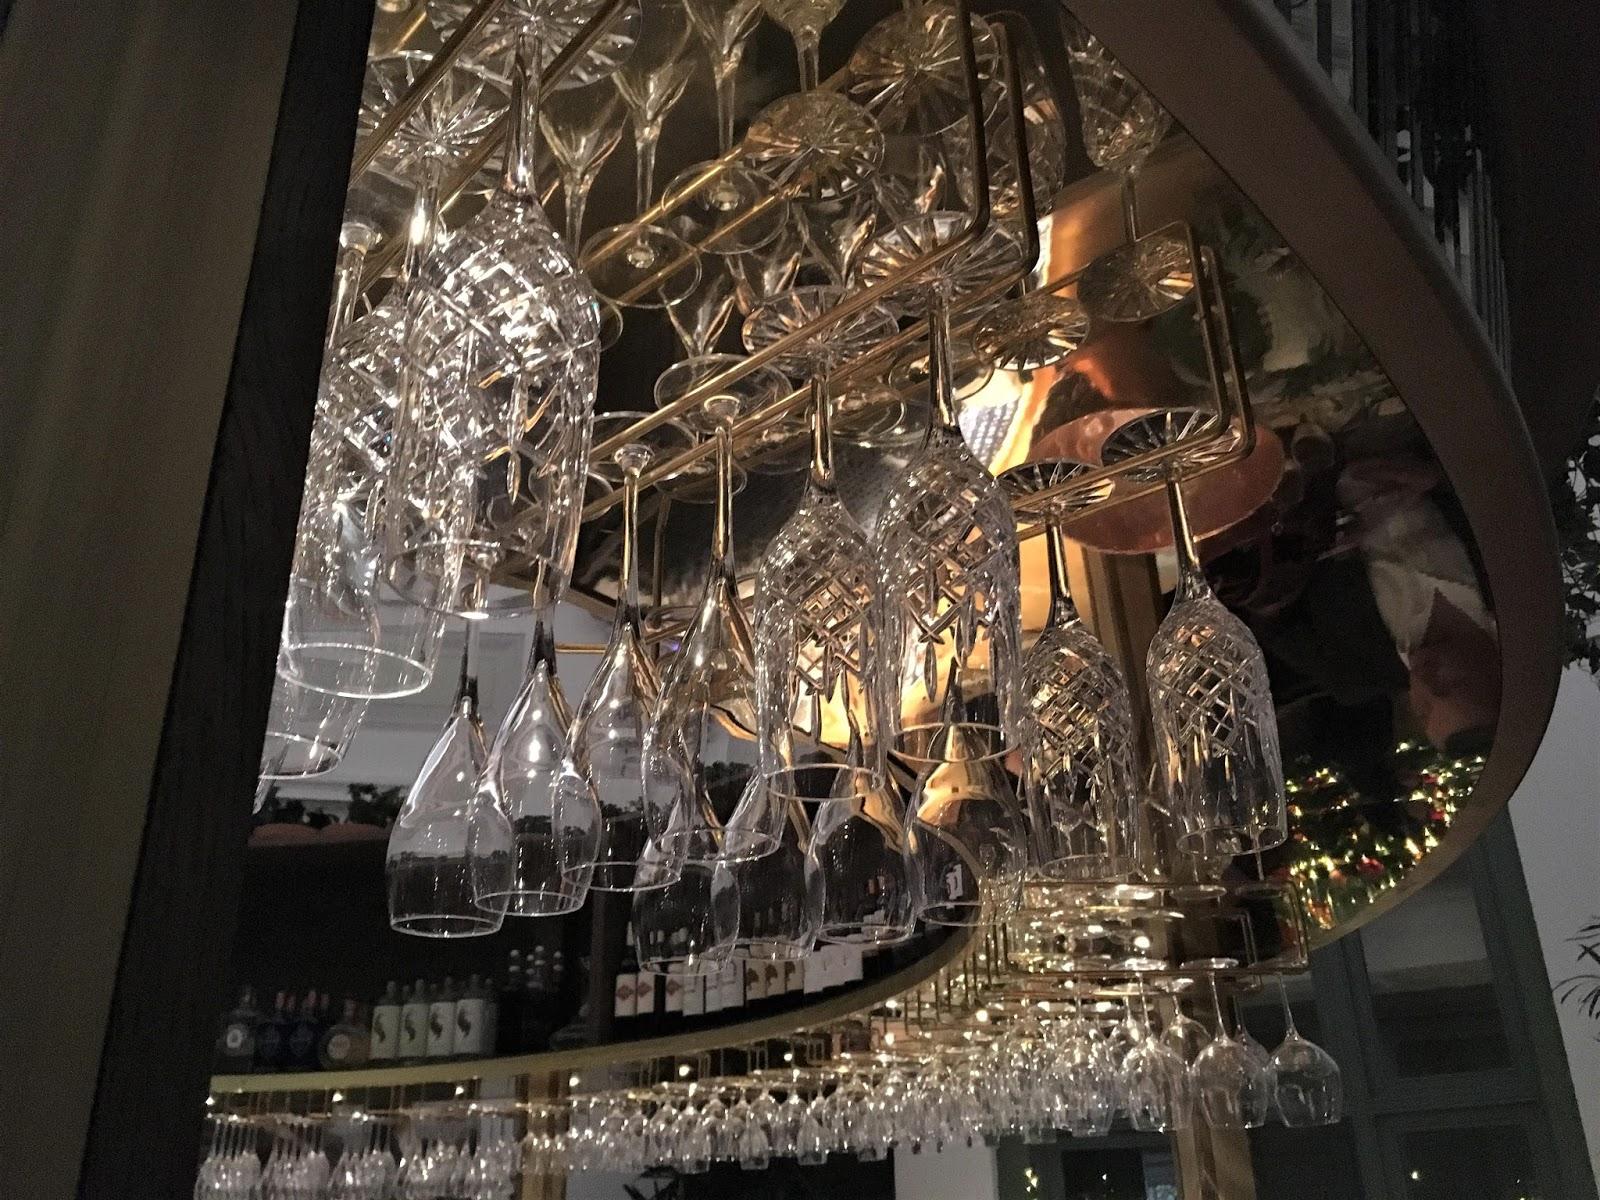 The Ivy Montpellier Brasserie, Cheltenham